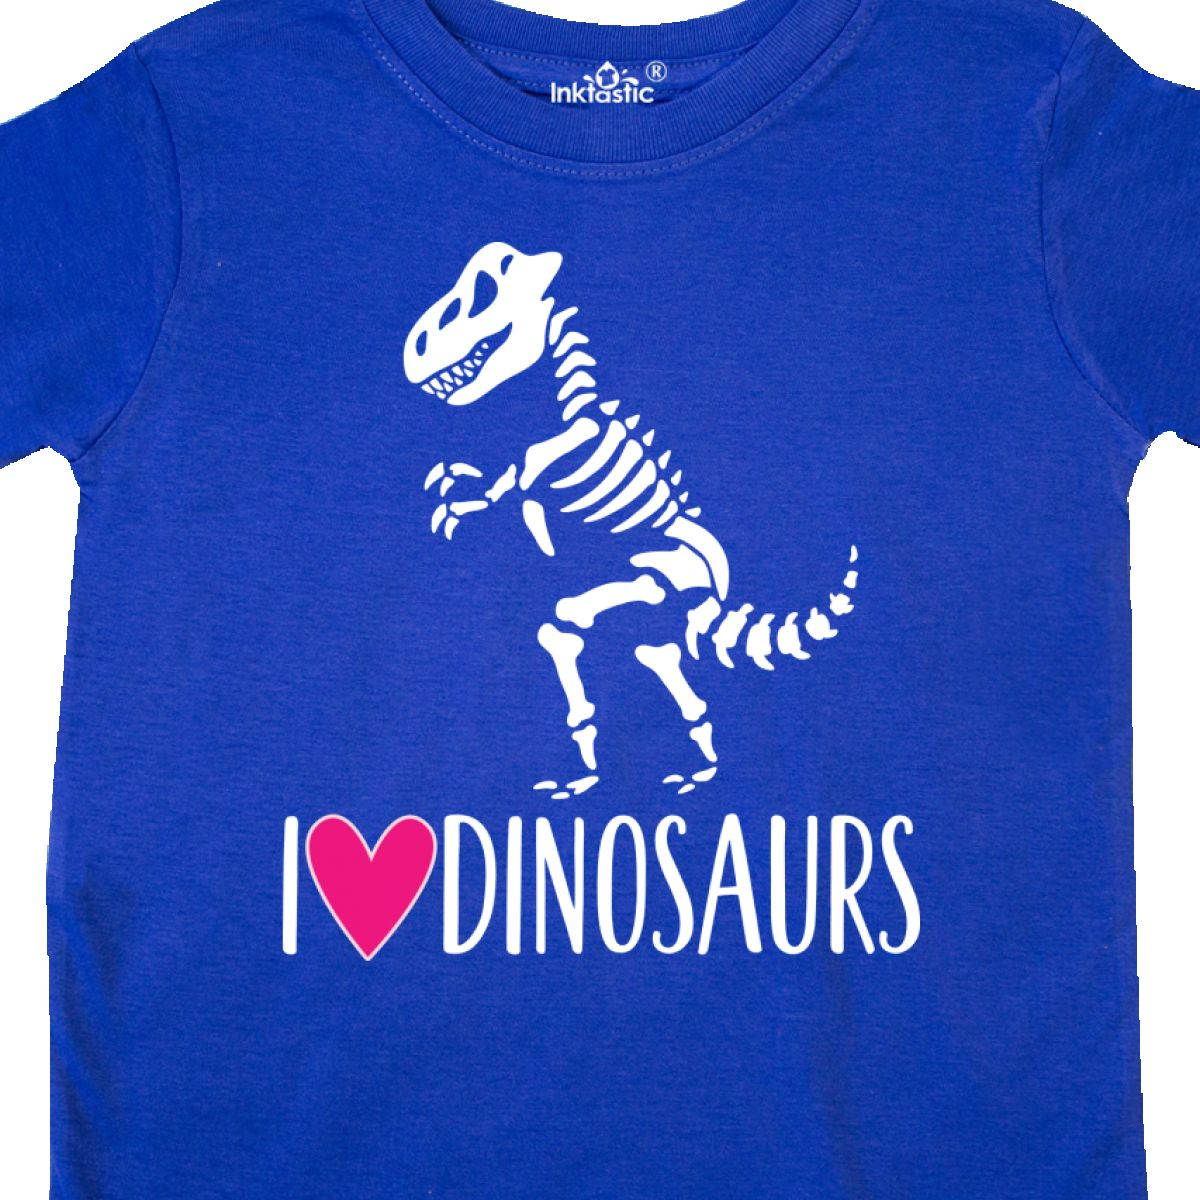 43d3c5a7 Inktastic Dinosaur Tyrannosaur Skeleton Girls Toddler T-Shirt Dino ...